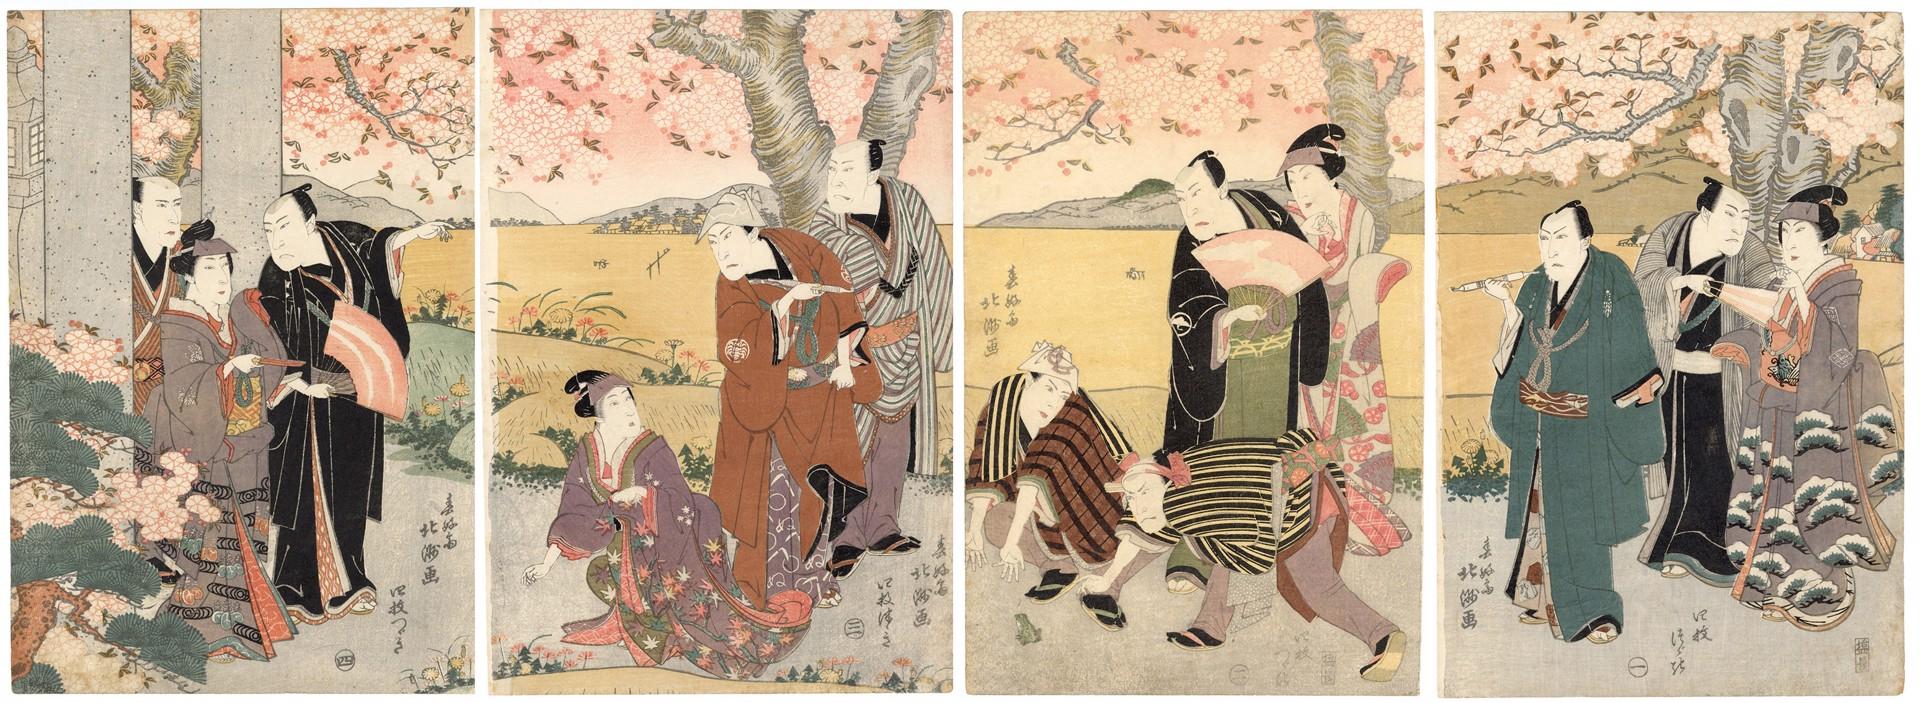 Kuniyoshi, Evening View of Hatcho Dike, 1847-48